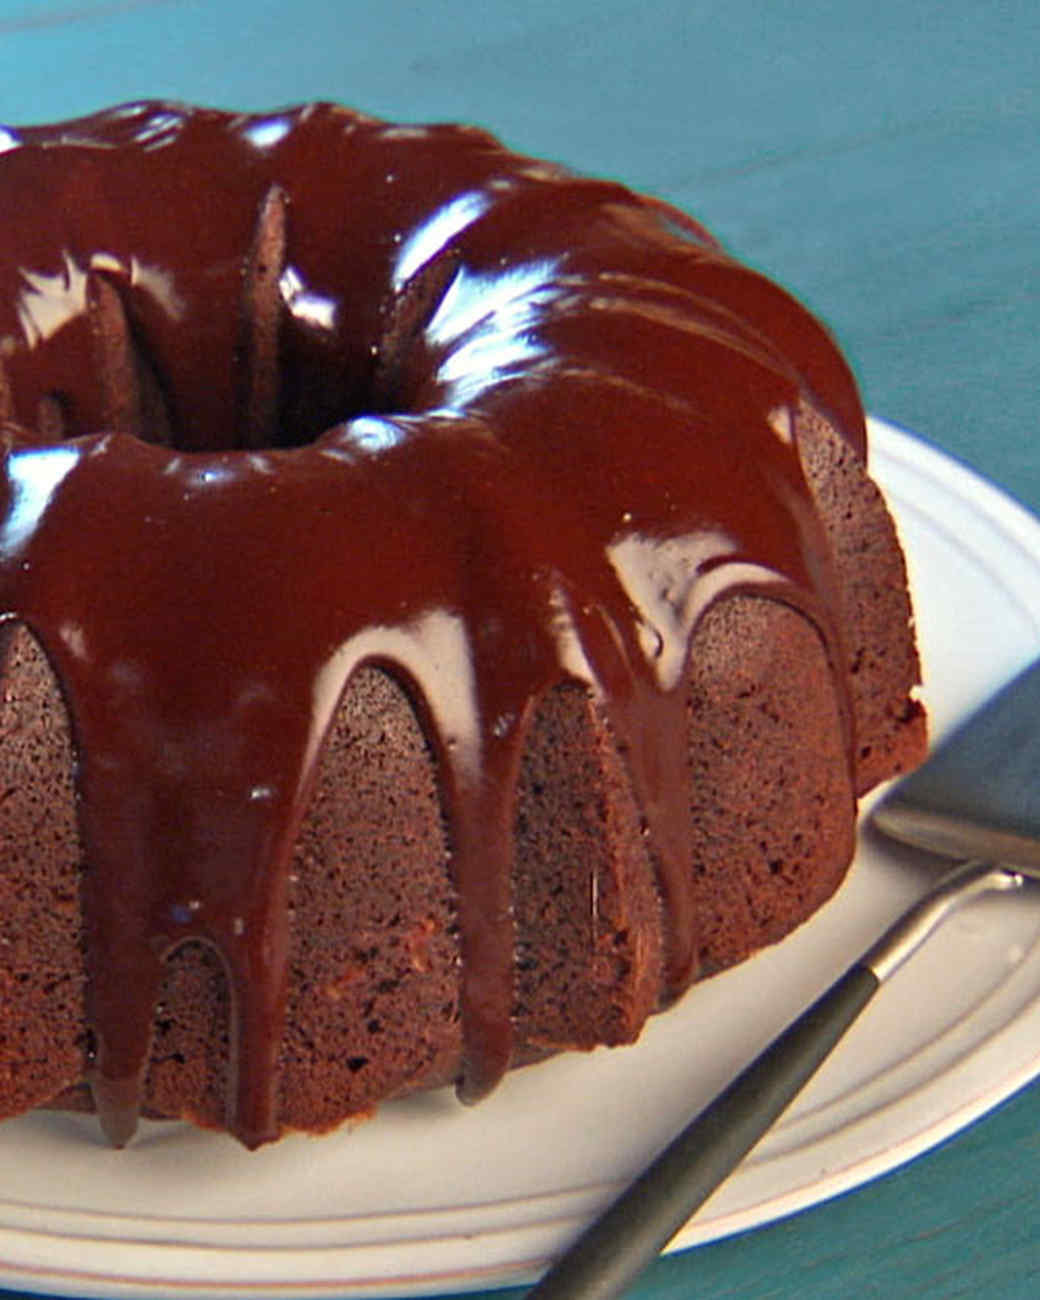 Dolly's Chocolate Bundt Cake Recipe & Video | Martha Stewart